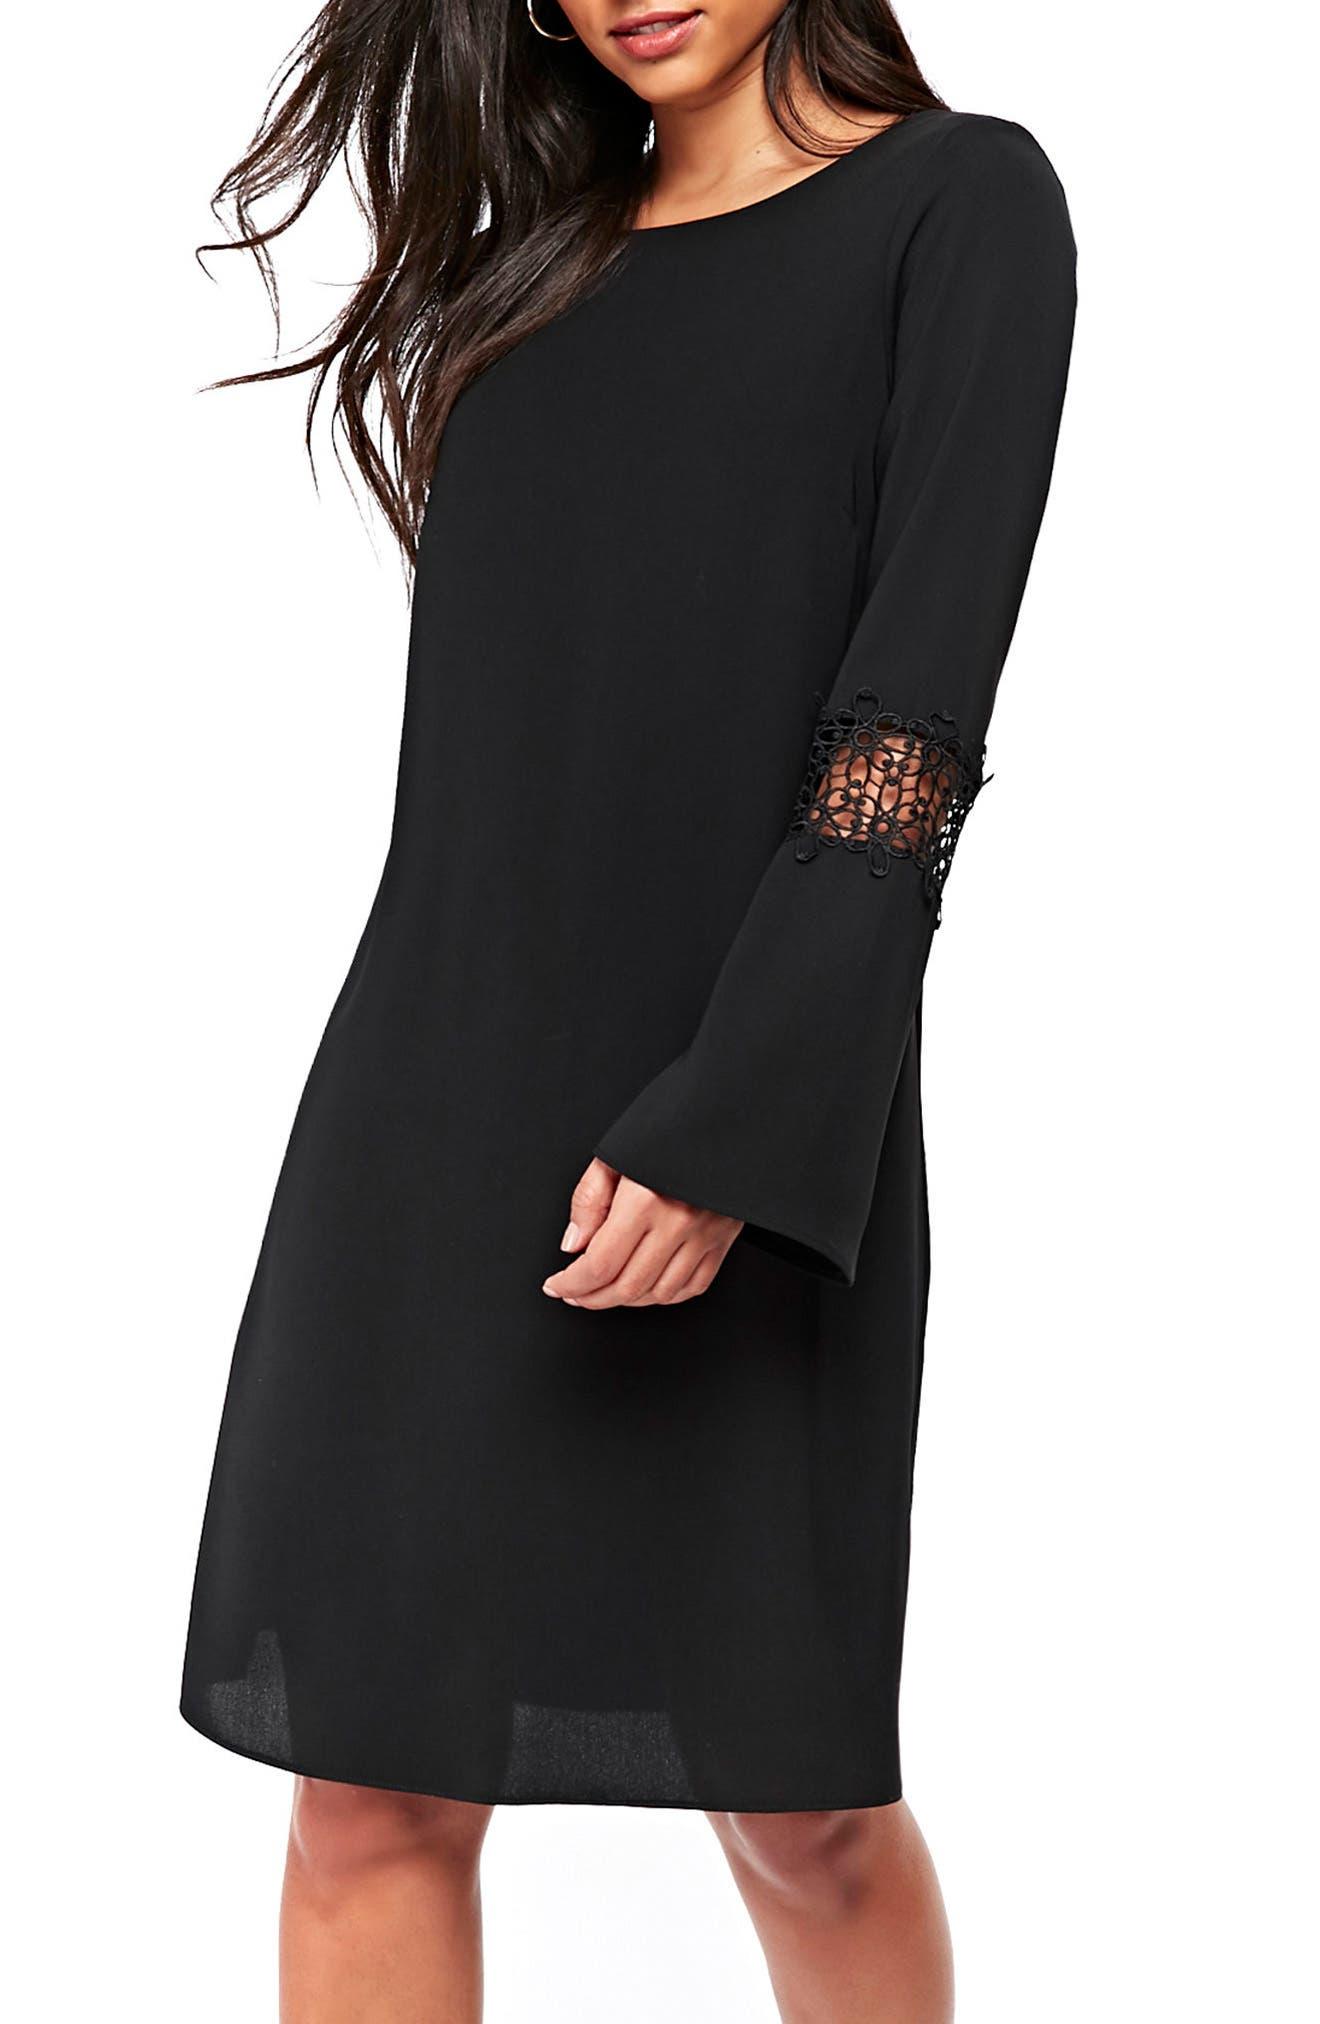 Crochet Inset Shift Dress,                             Main thumbnail 1, color,                             Black